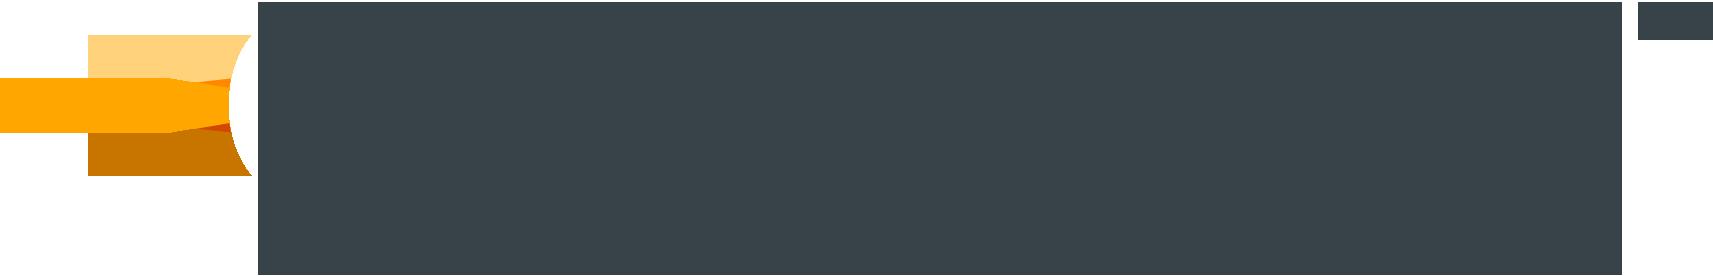 OPROSSO survey